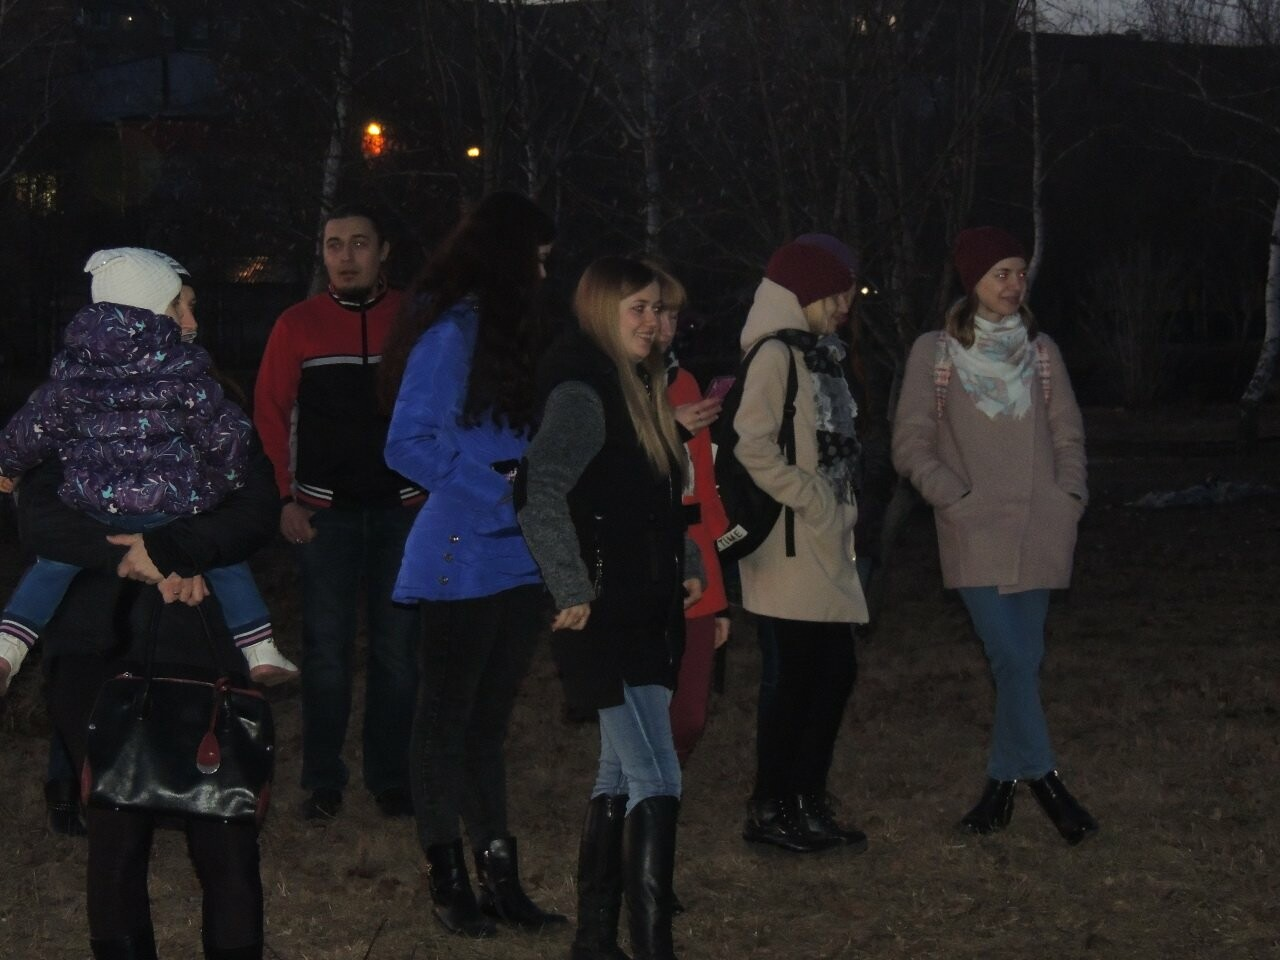 Тамбовчане отметили День космонавтики вместе с порталом Go68 и «Радио Дача», фото-8